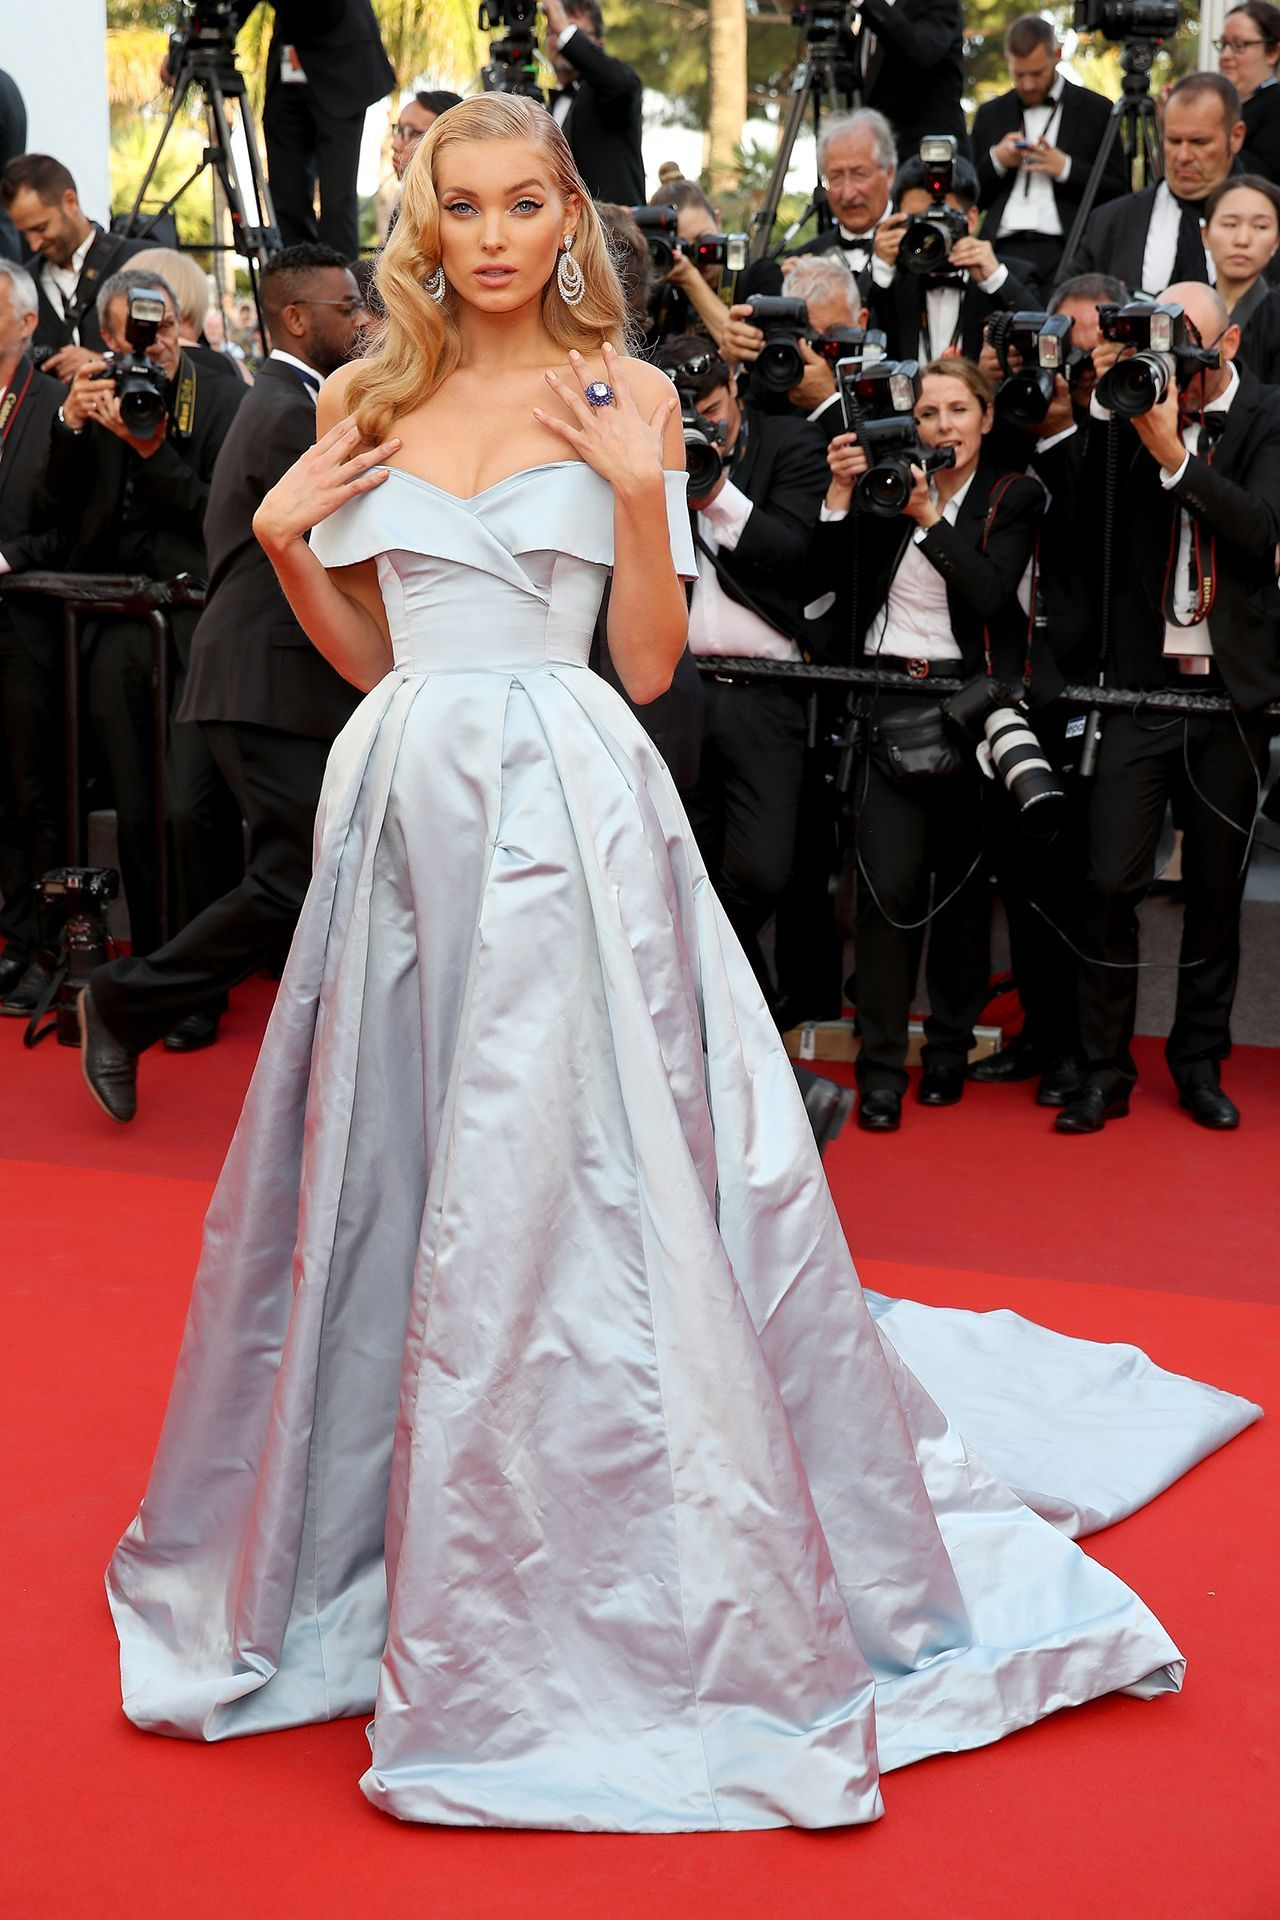 Cannes Film Festival 2017   Red carpet dresses, Celebrity ...